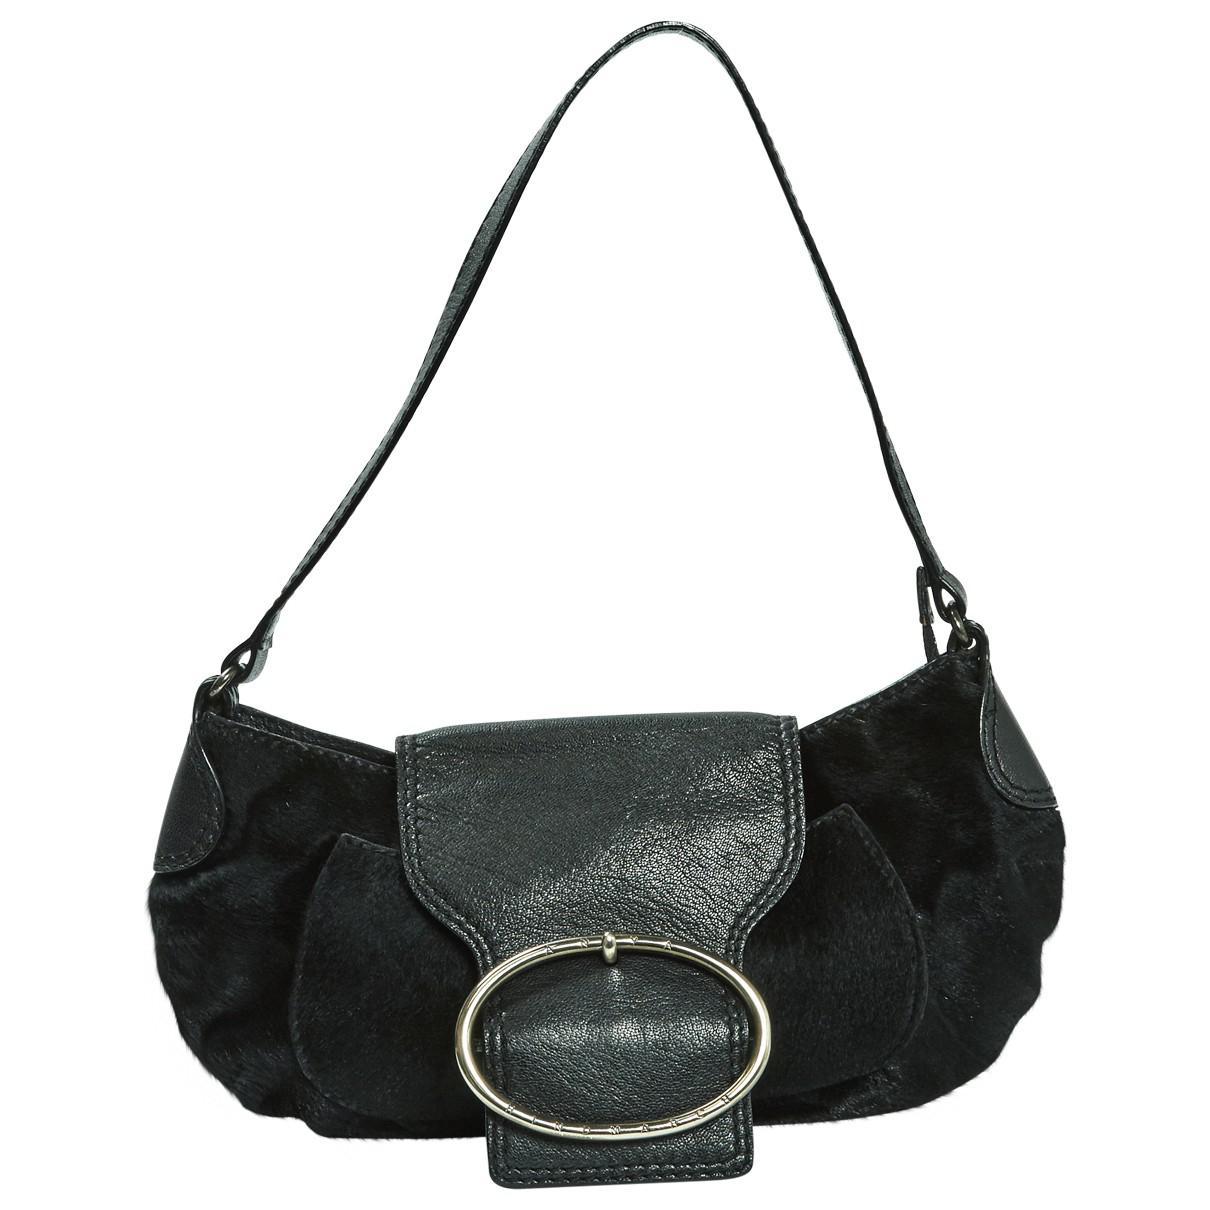 664be02f47c6 Lyst - Anya Hindmarch Pony-style Calfskin Mini Bag in Black